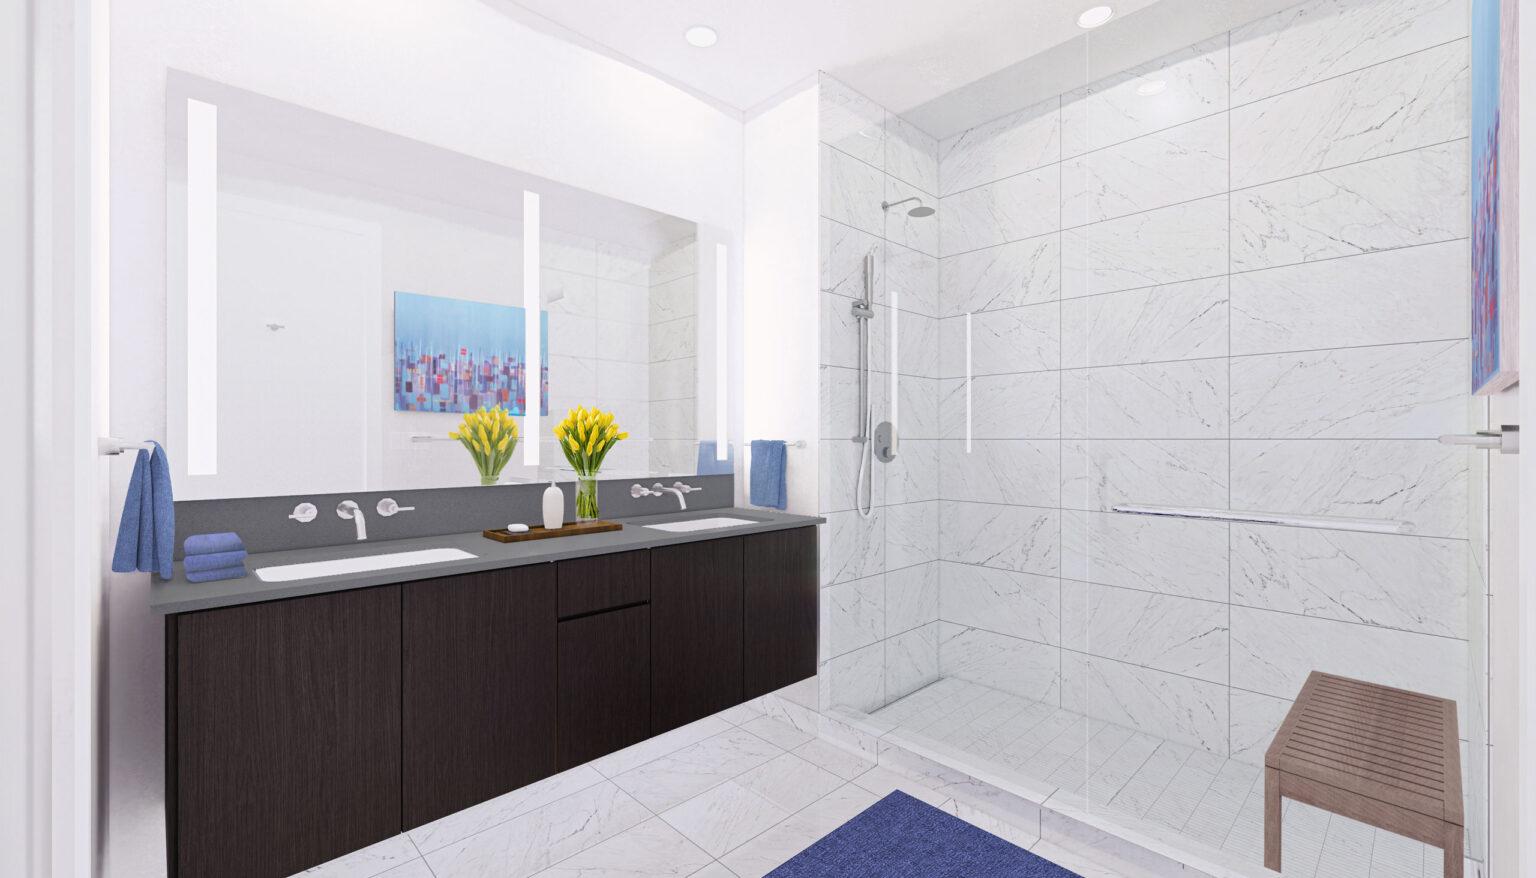 Penthouse B bathroom palette, Rustic Urban